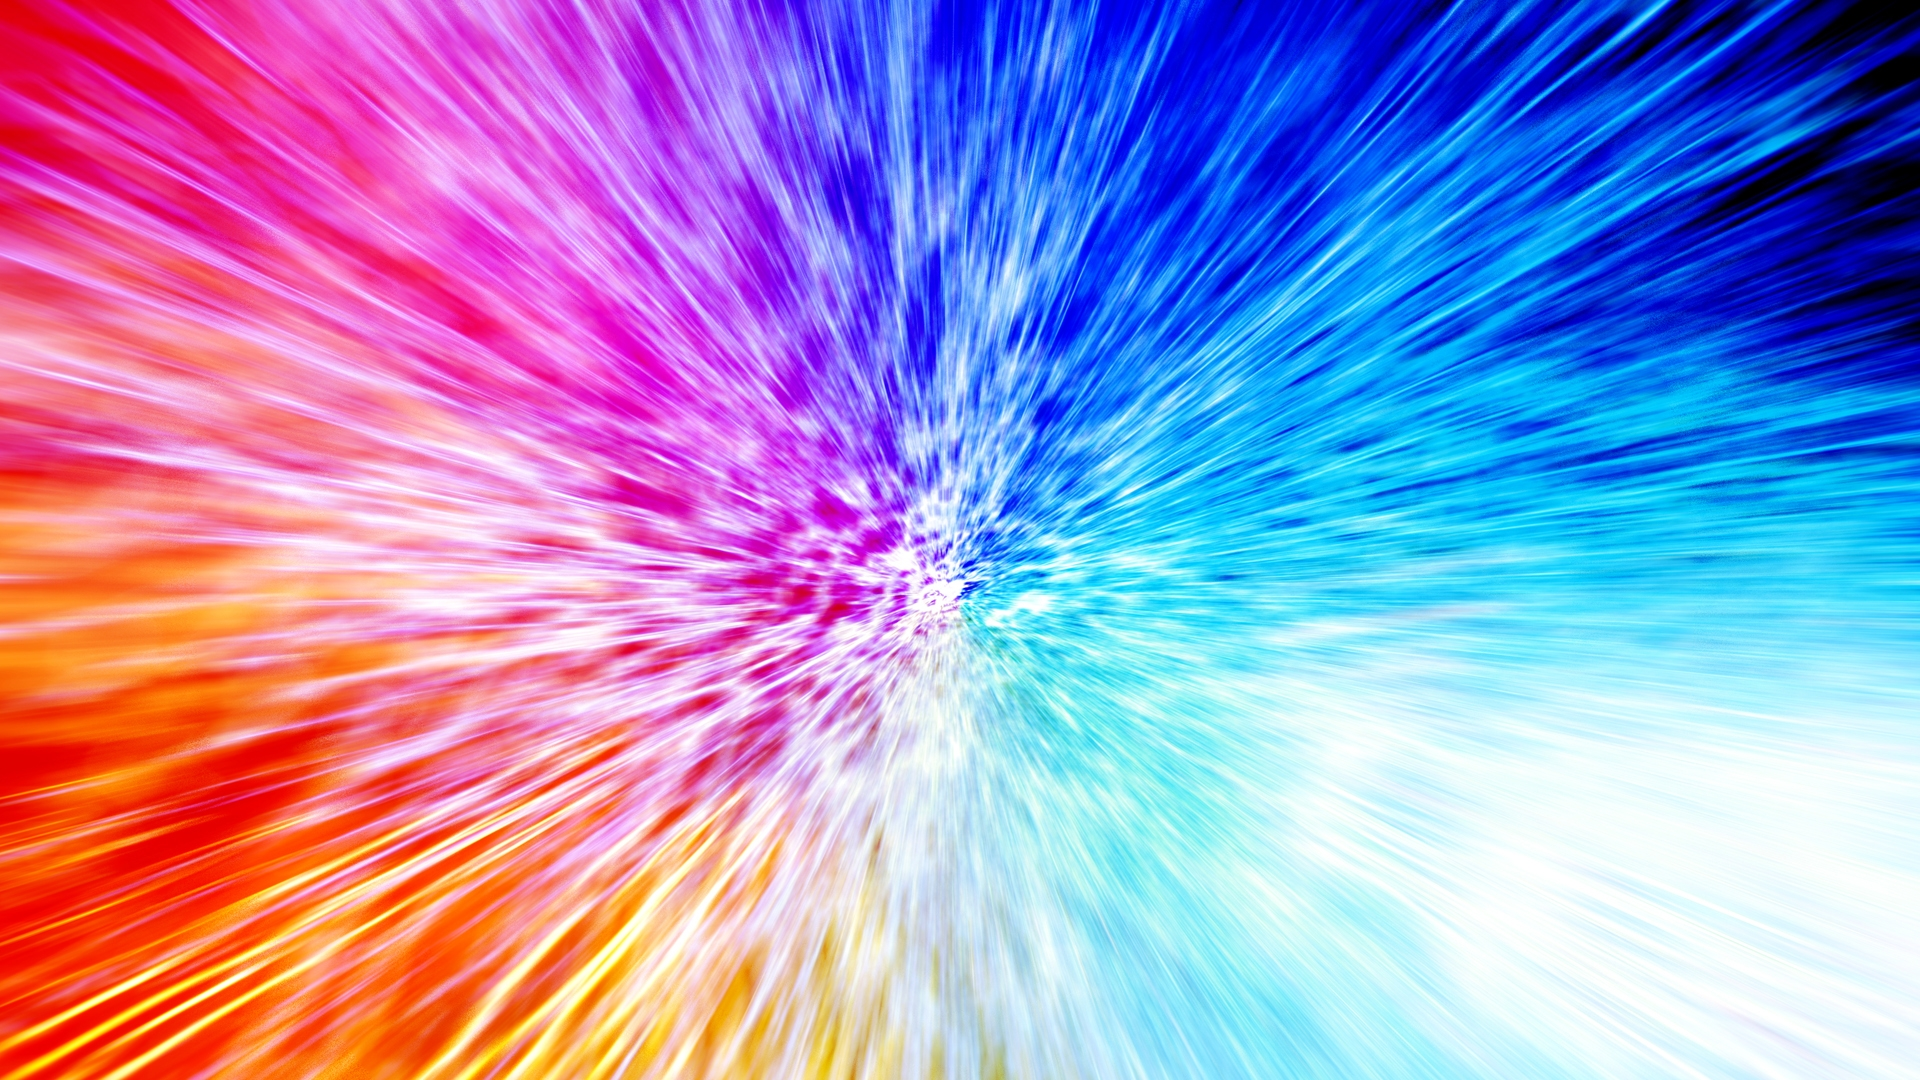 HD Optical Illusion Backgrounds  PixelsTalkNet